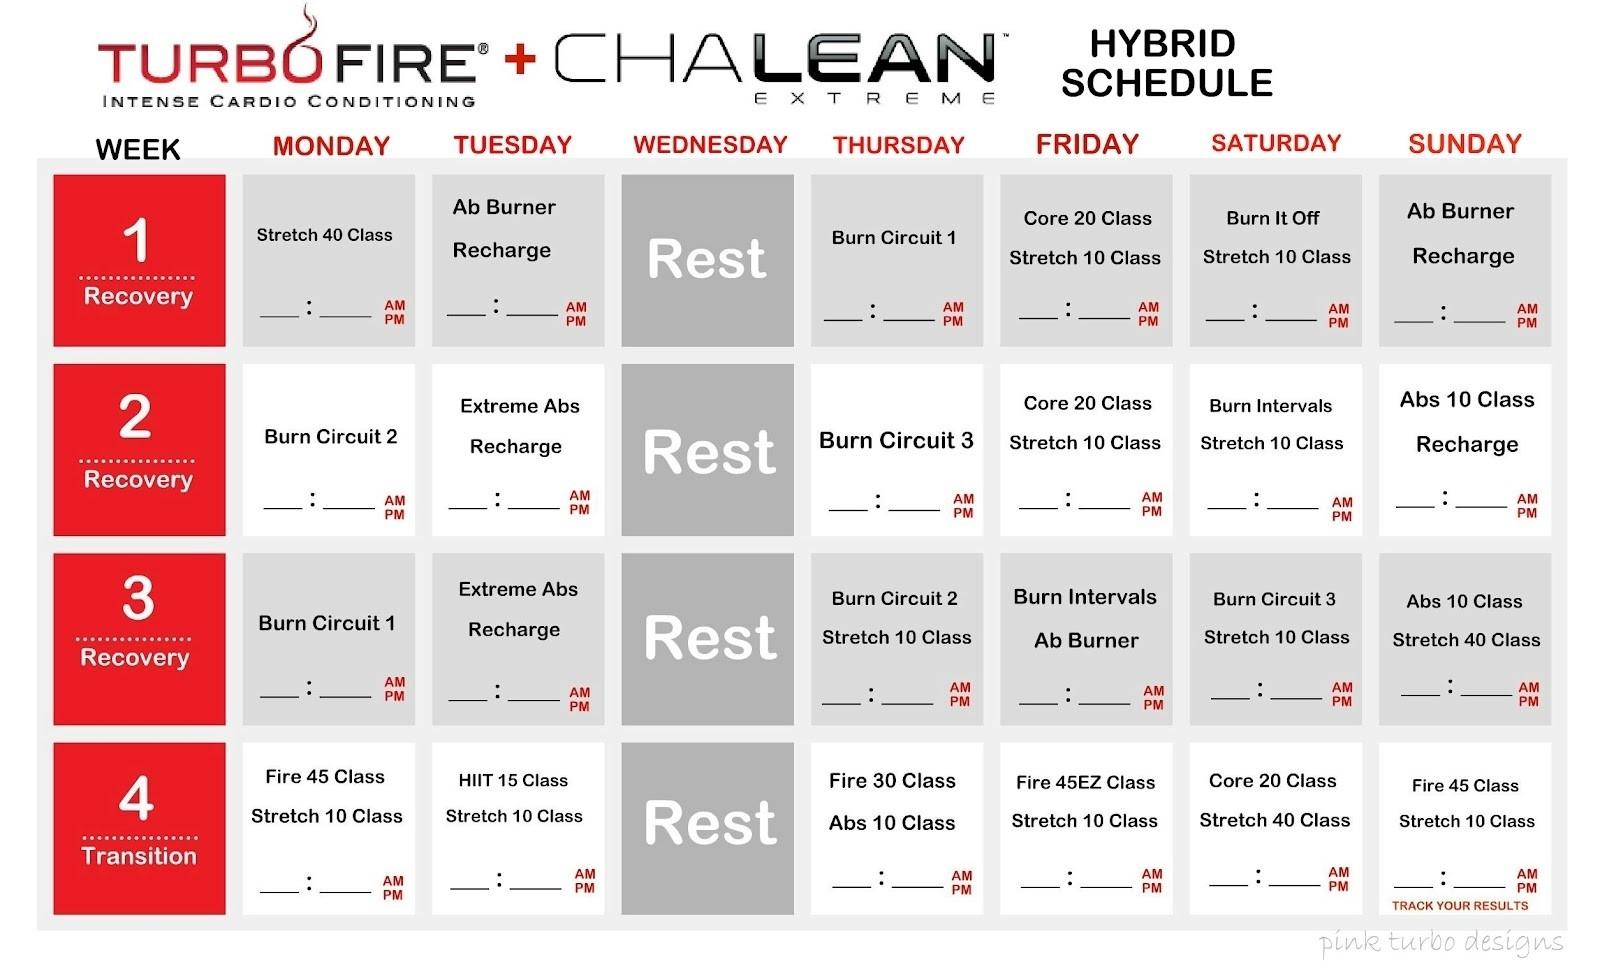 Clx Tf Schedule Month 1 20 Turbo Fire Calendar | Settoplinux